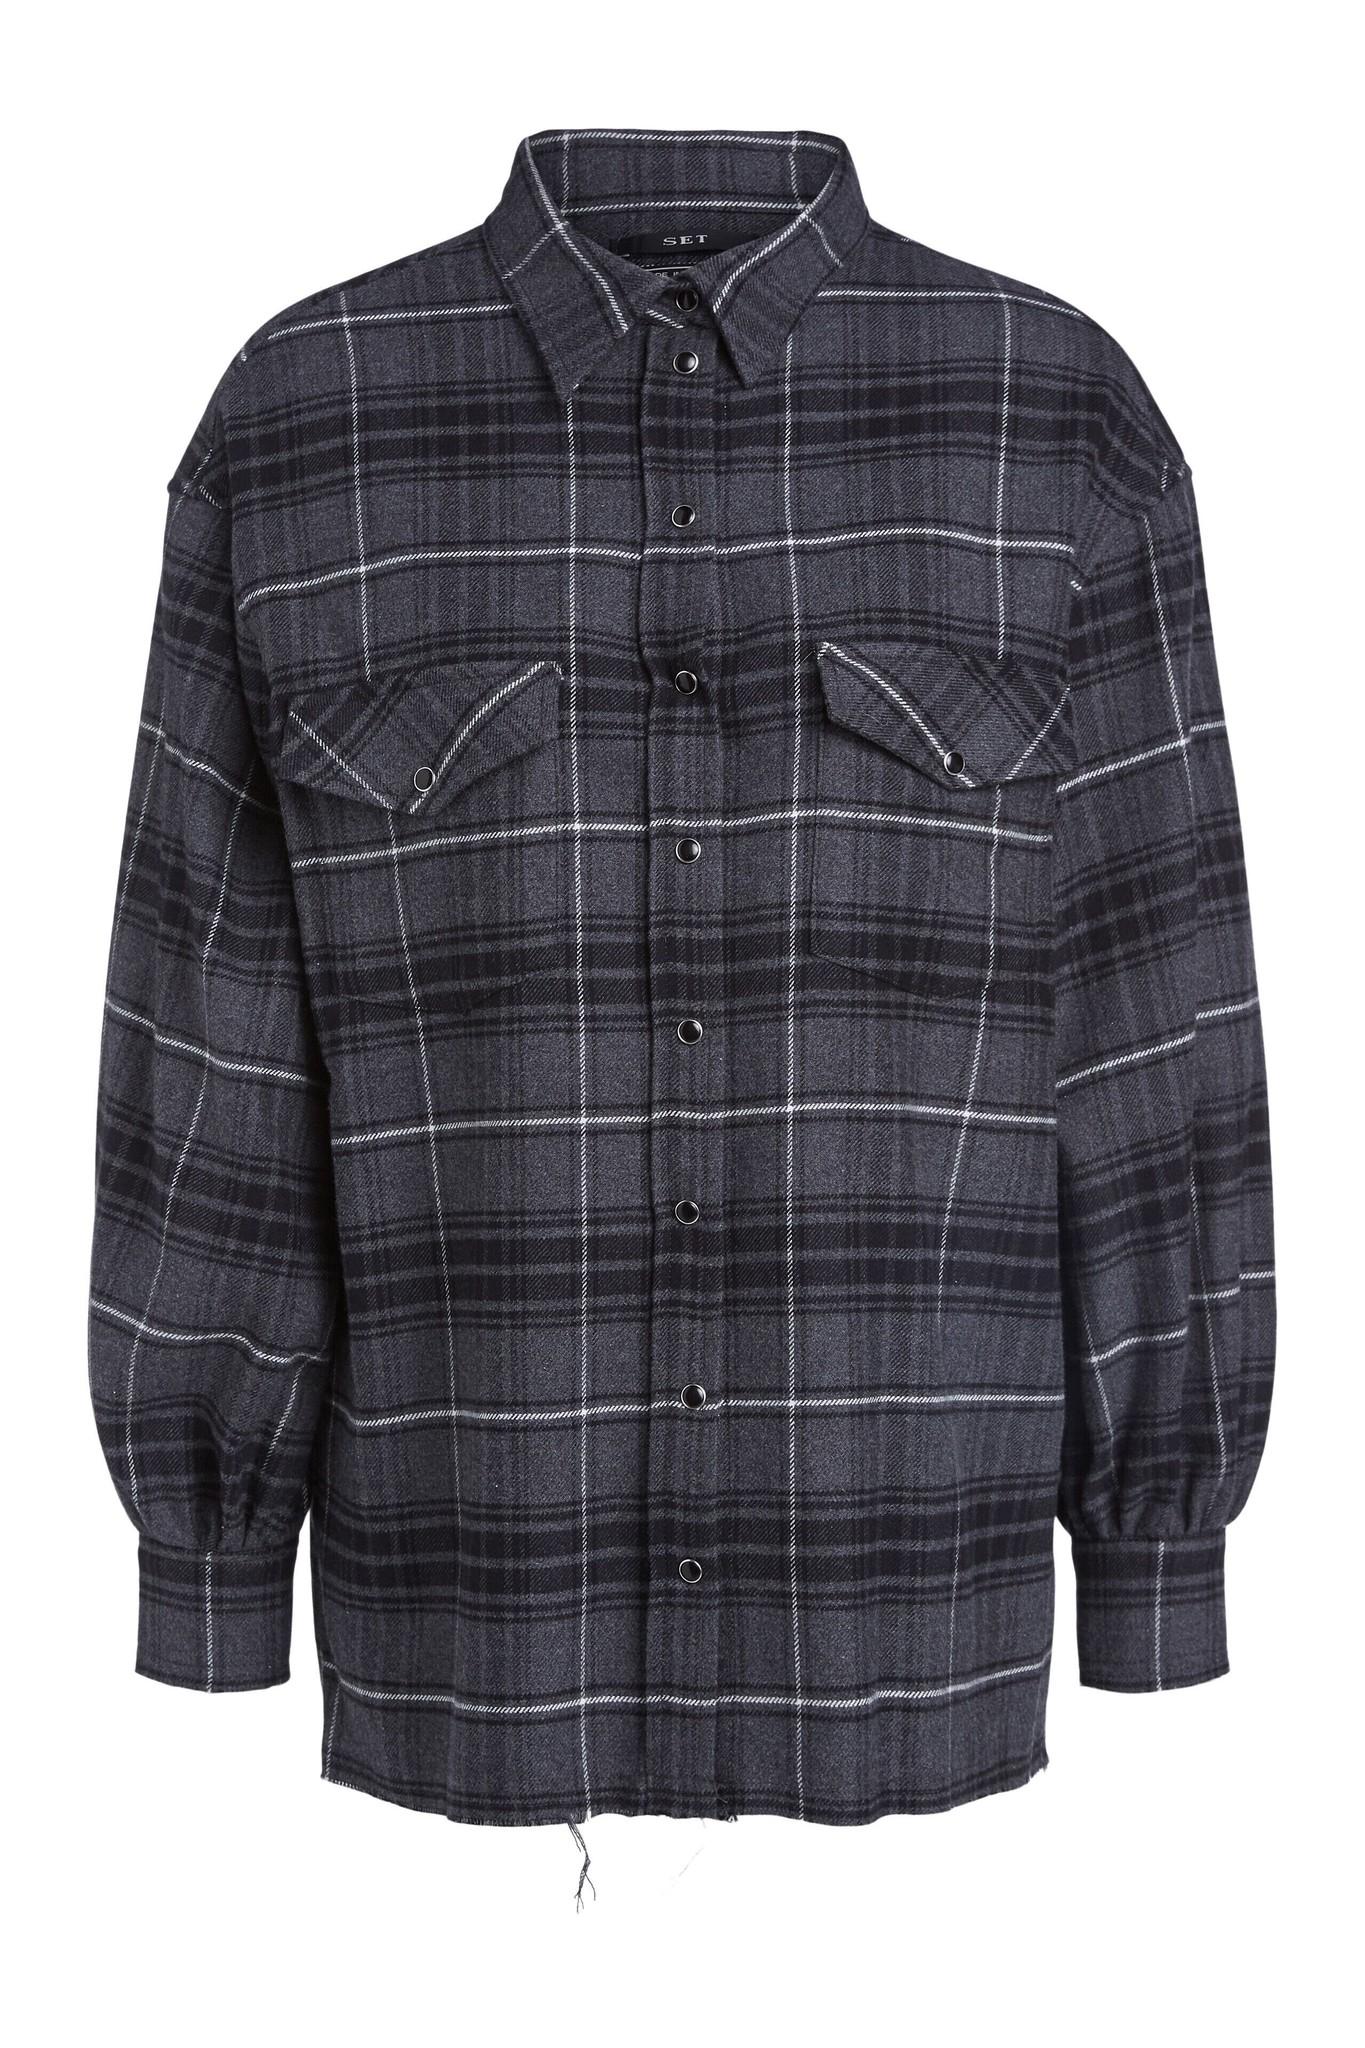 SET blouse 74398 0971-1